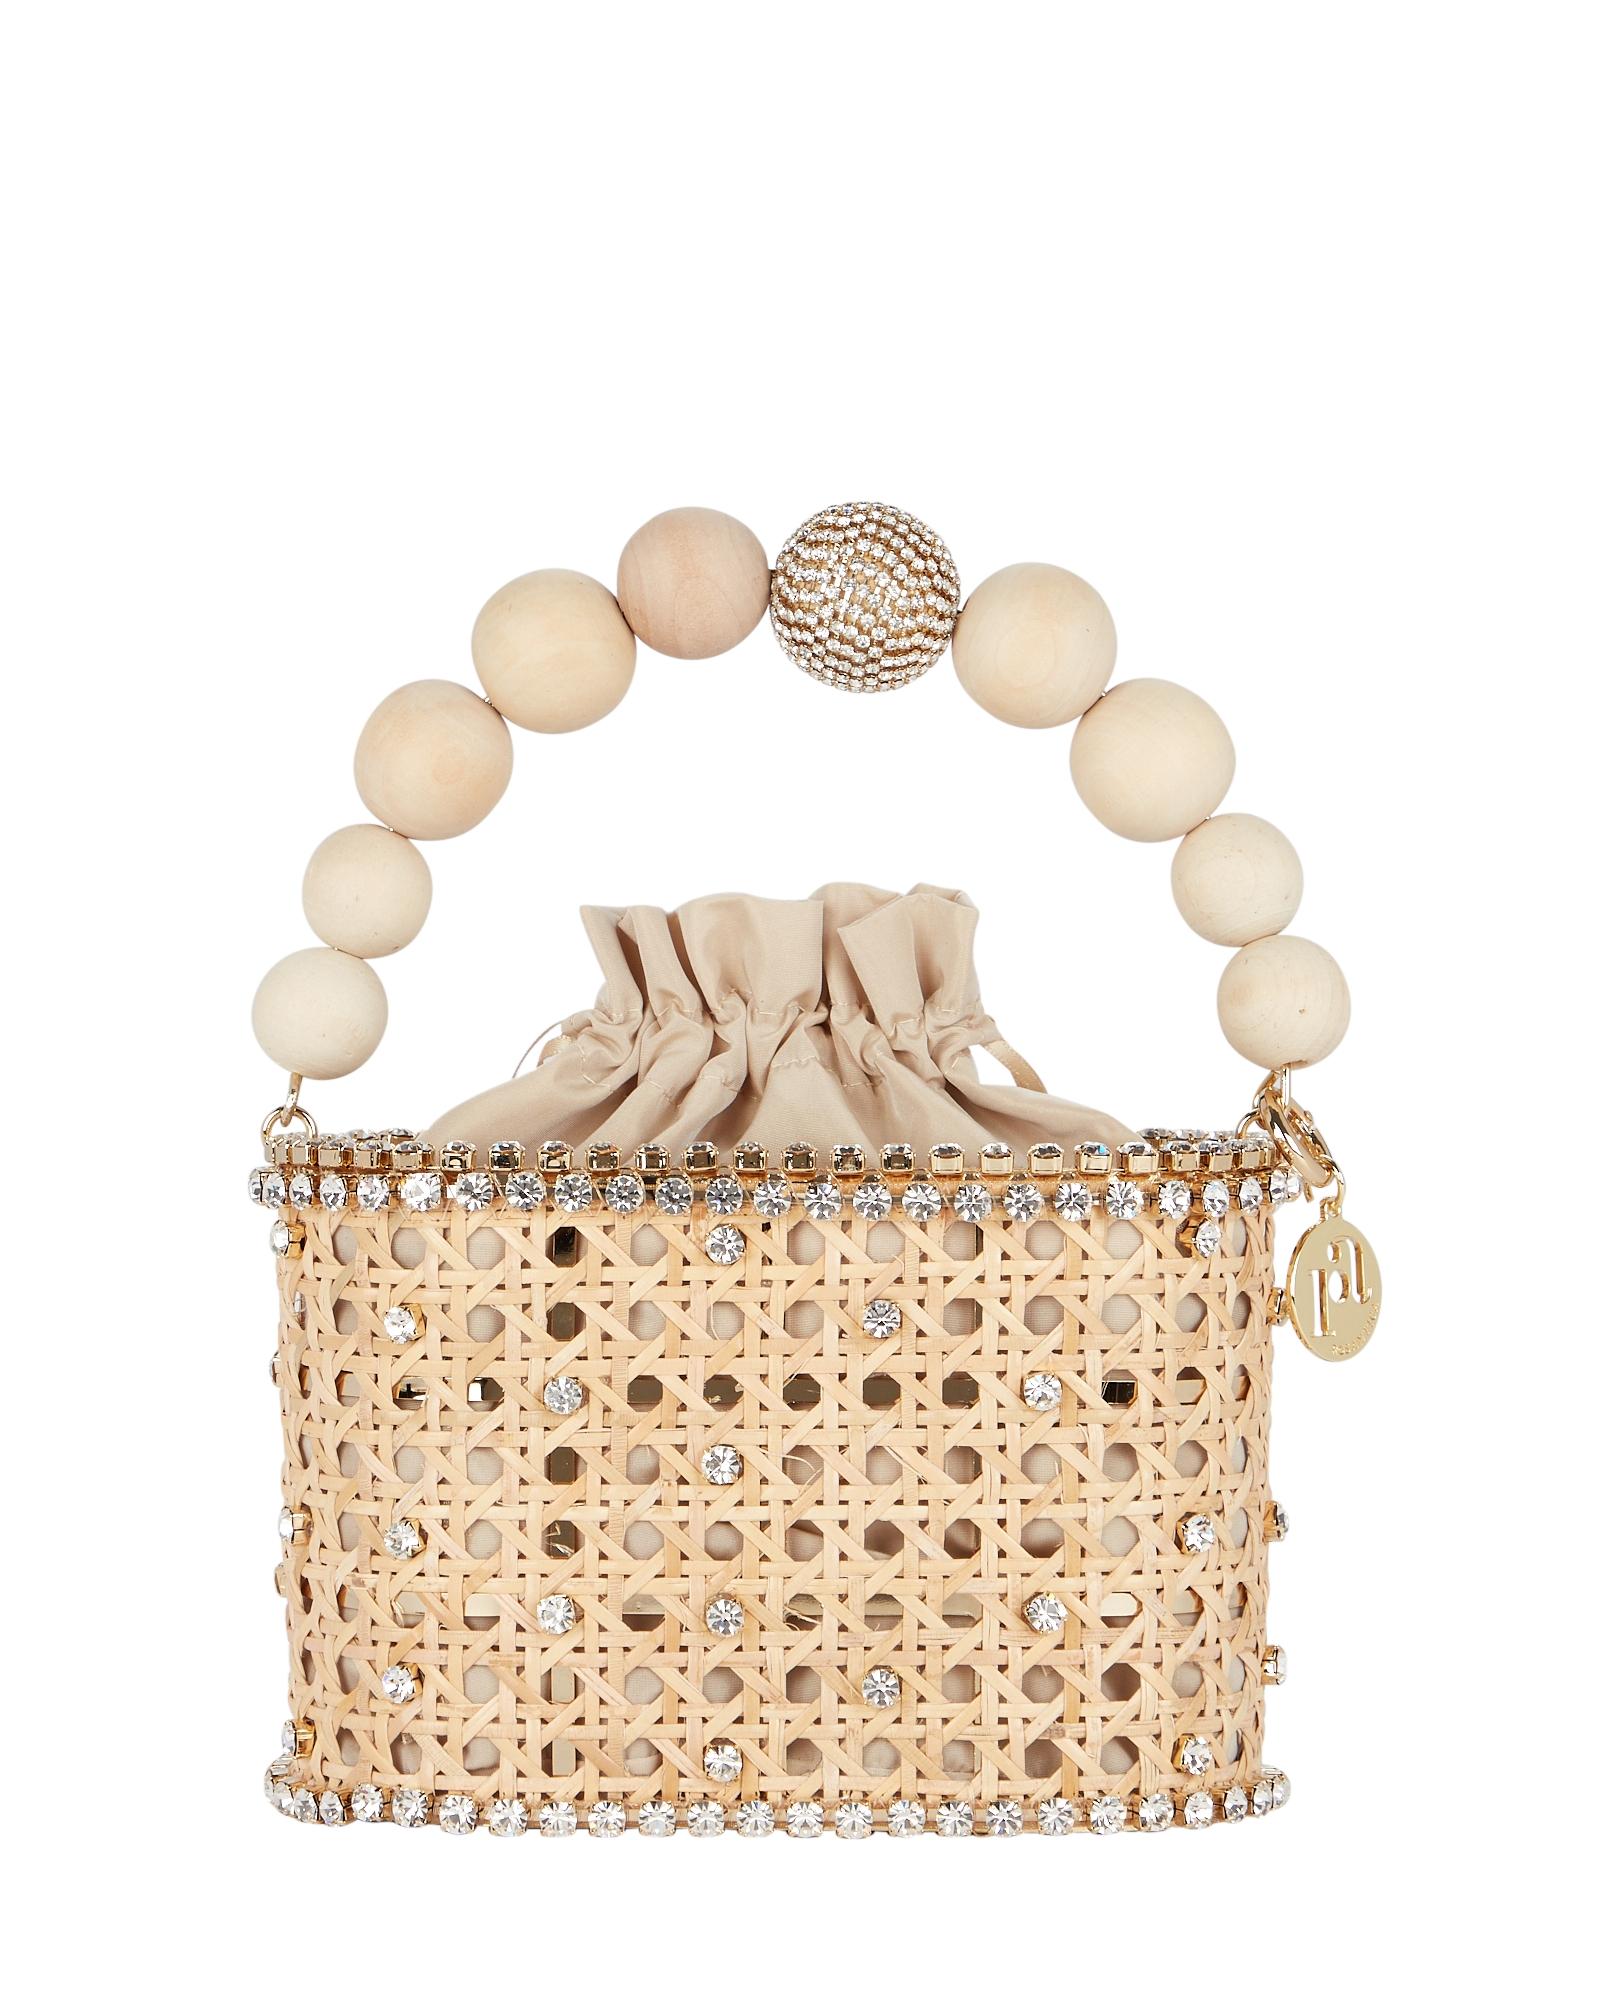 Rosantica Bags Holli Vienna Wicker Caged Clutch